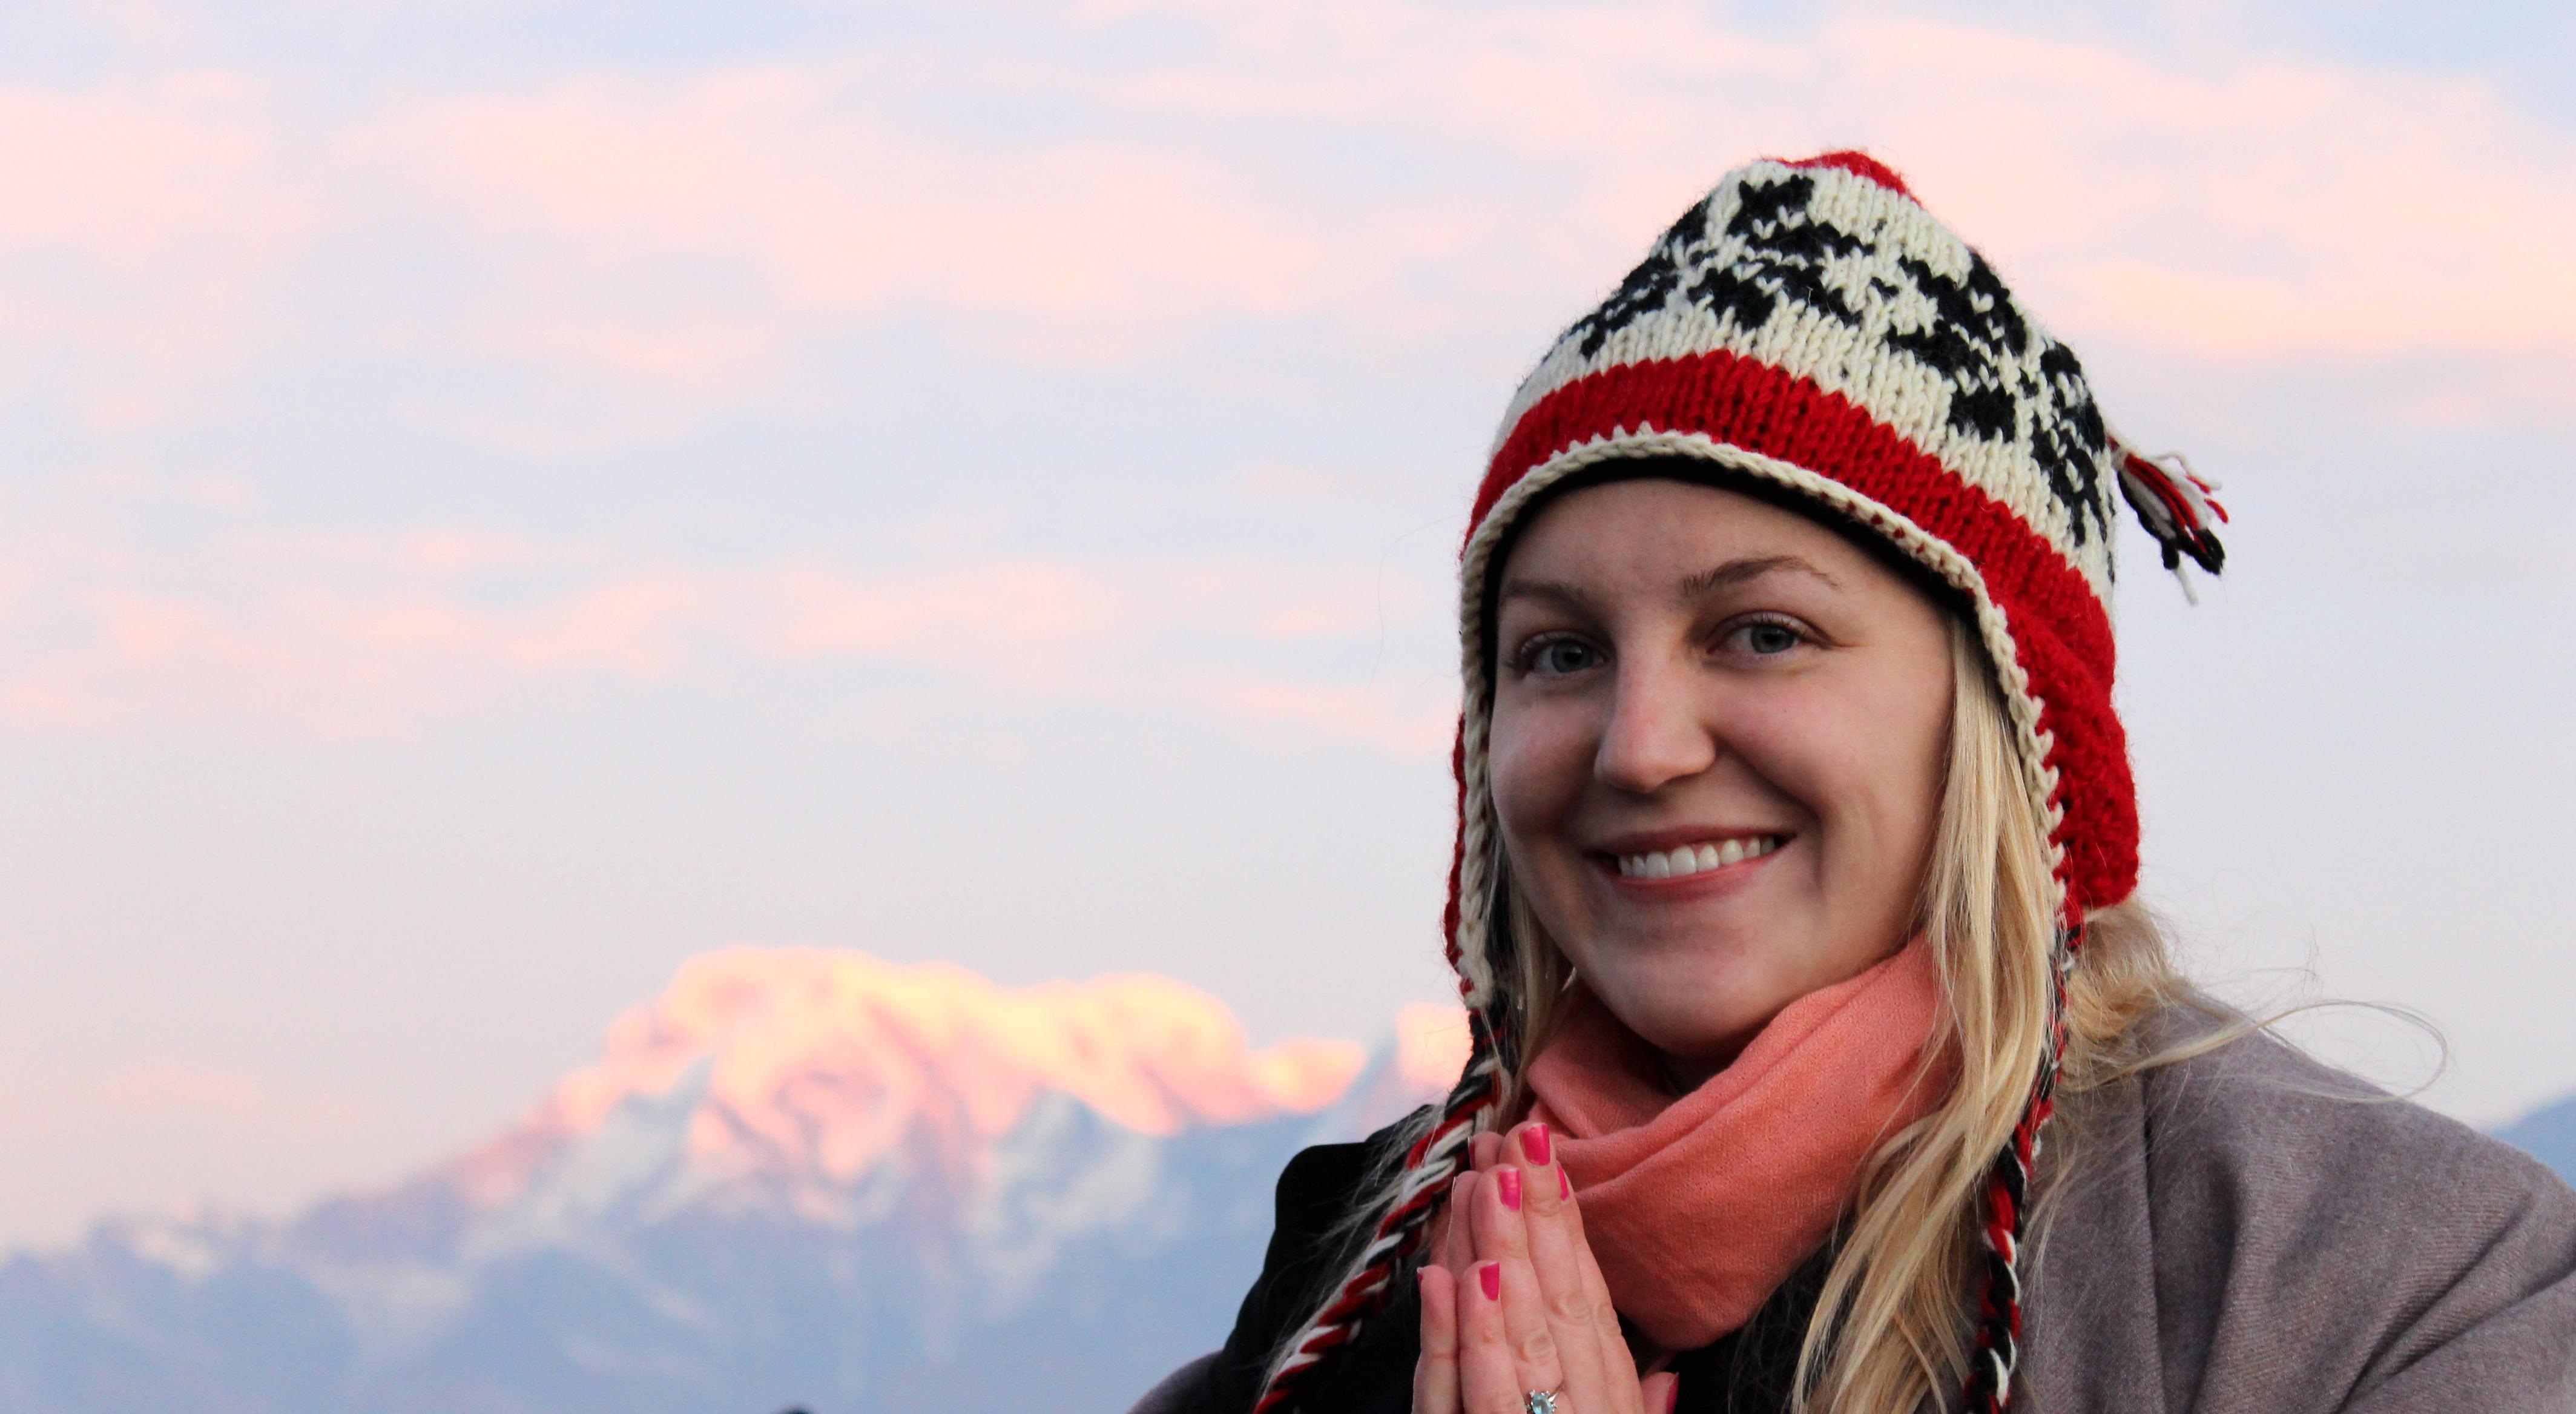 Sunrise in Pokhara